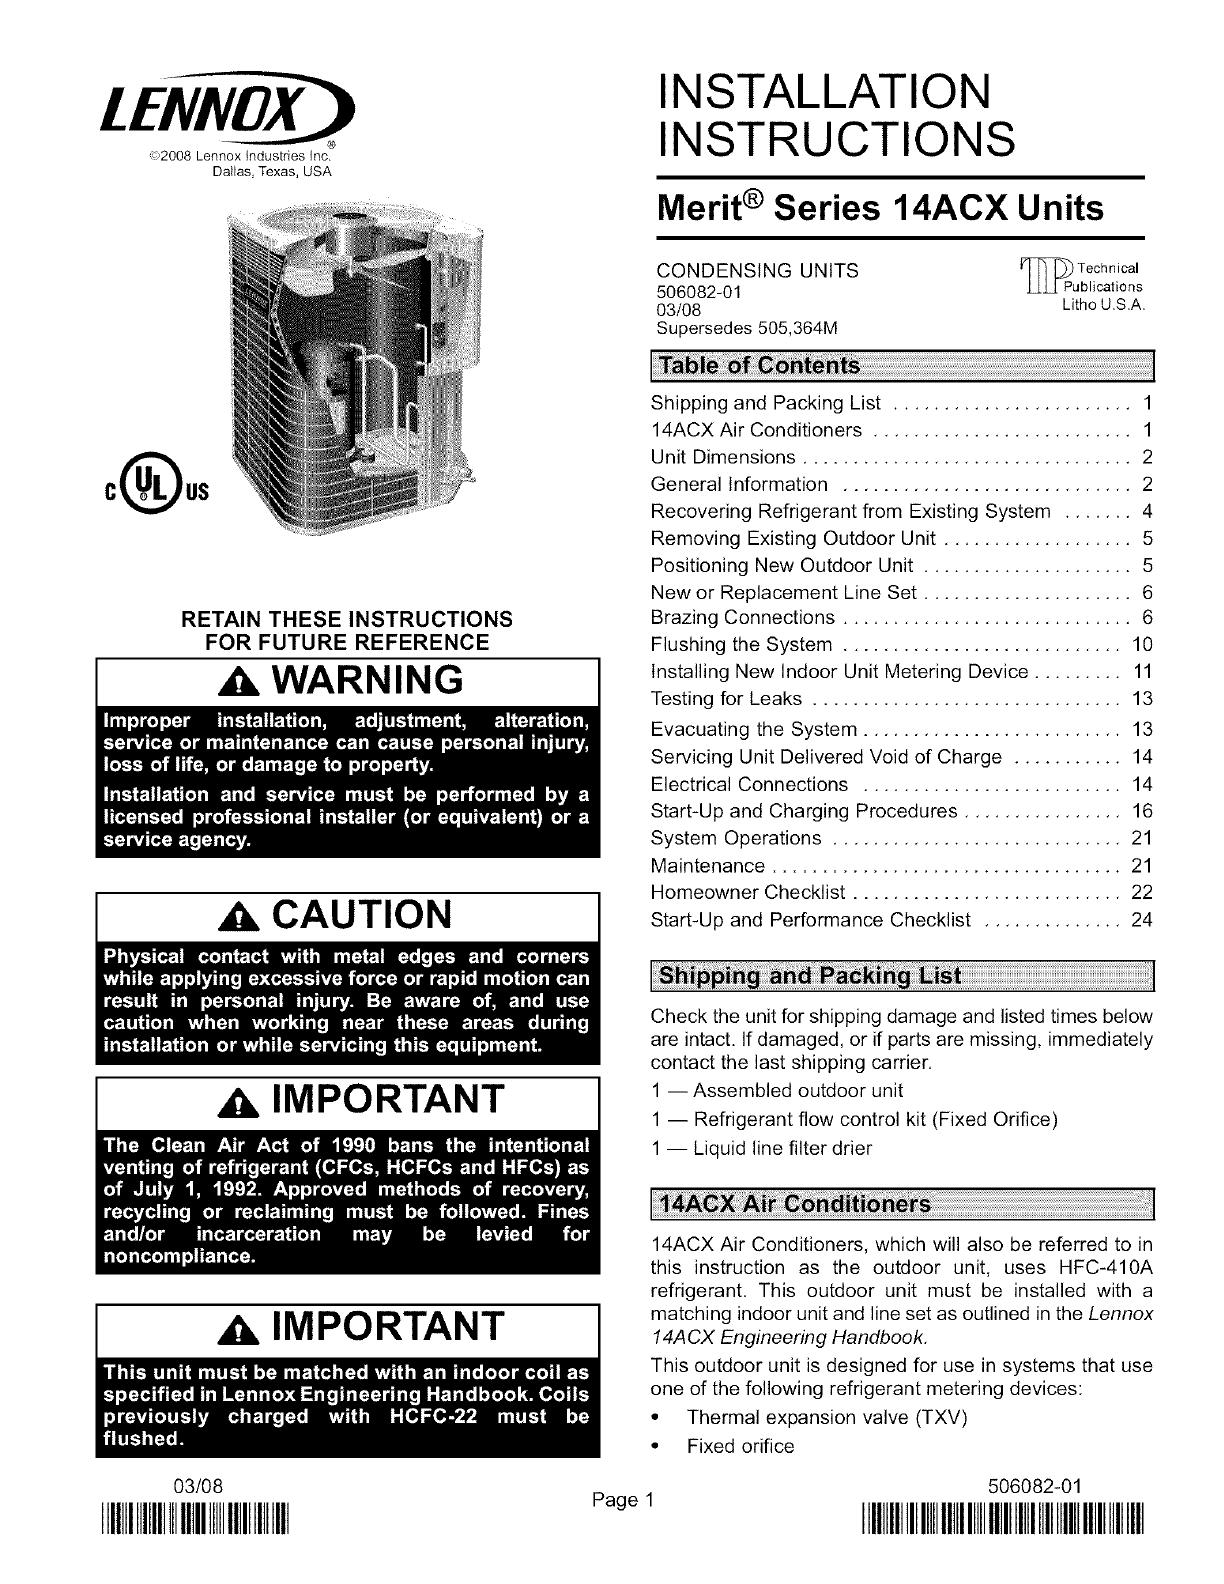 LENNOX Air Conditioner/heat Pump(outside Unit) Manual L0805455